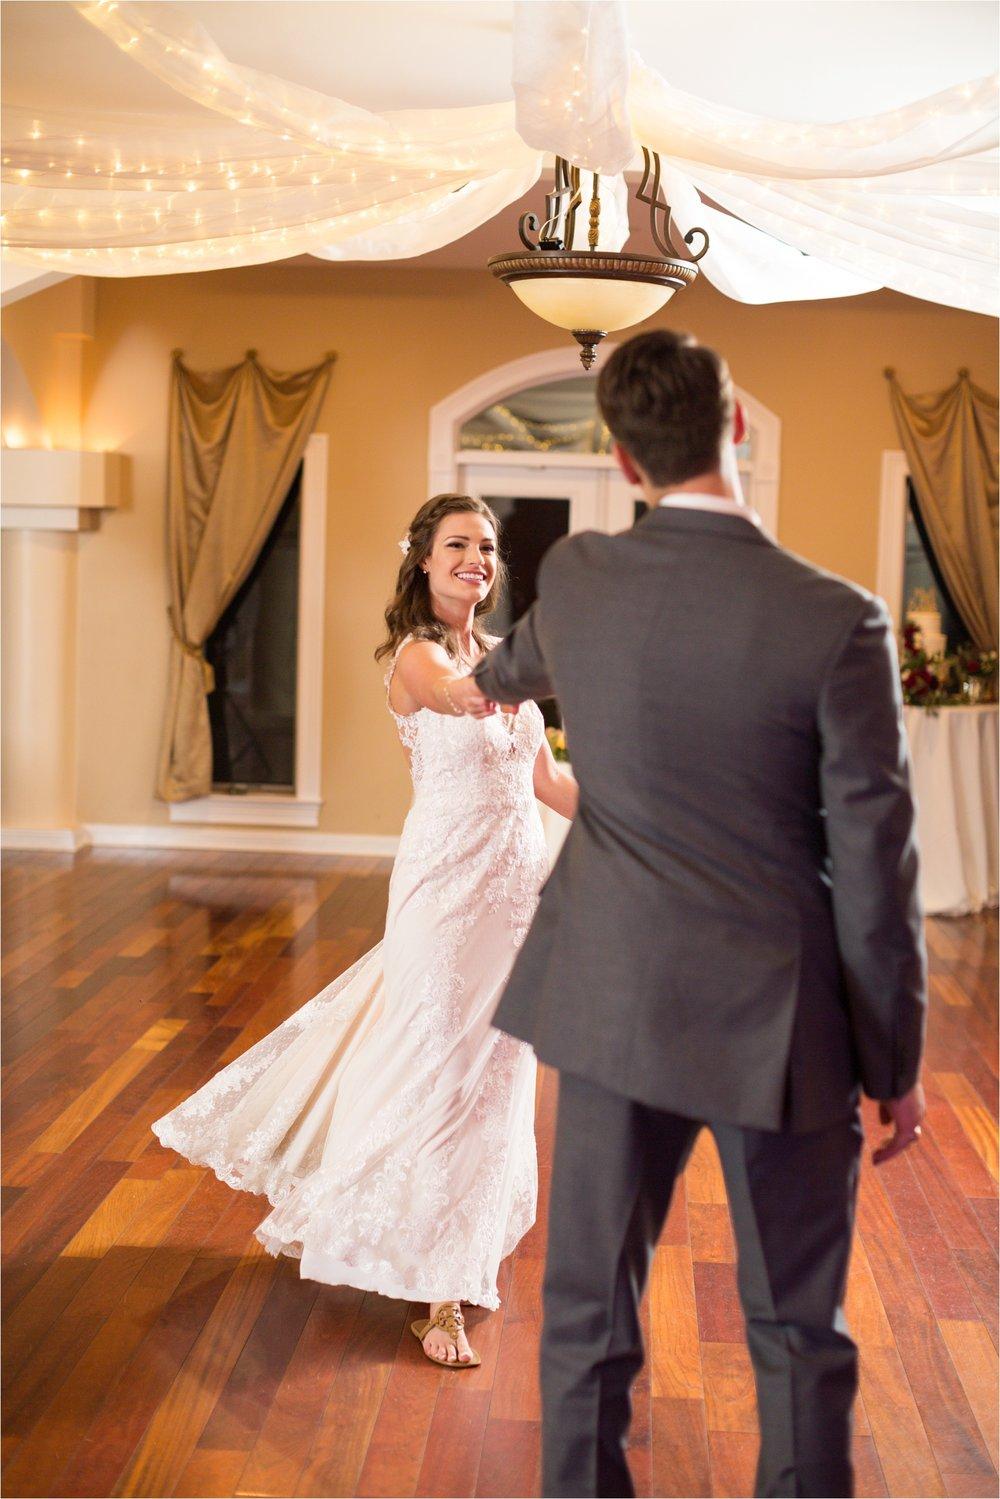 Feather-and-Oak-Photography-Cross-Keys-Vineyard-Wedding-1551.jpg